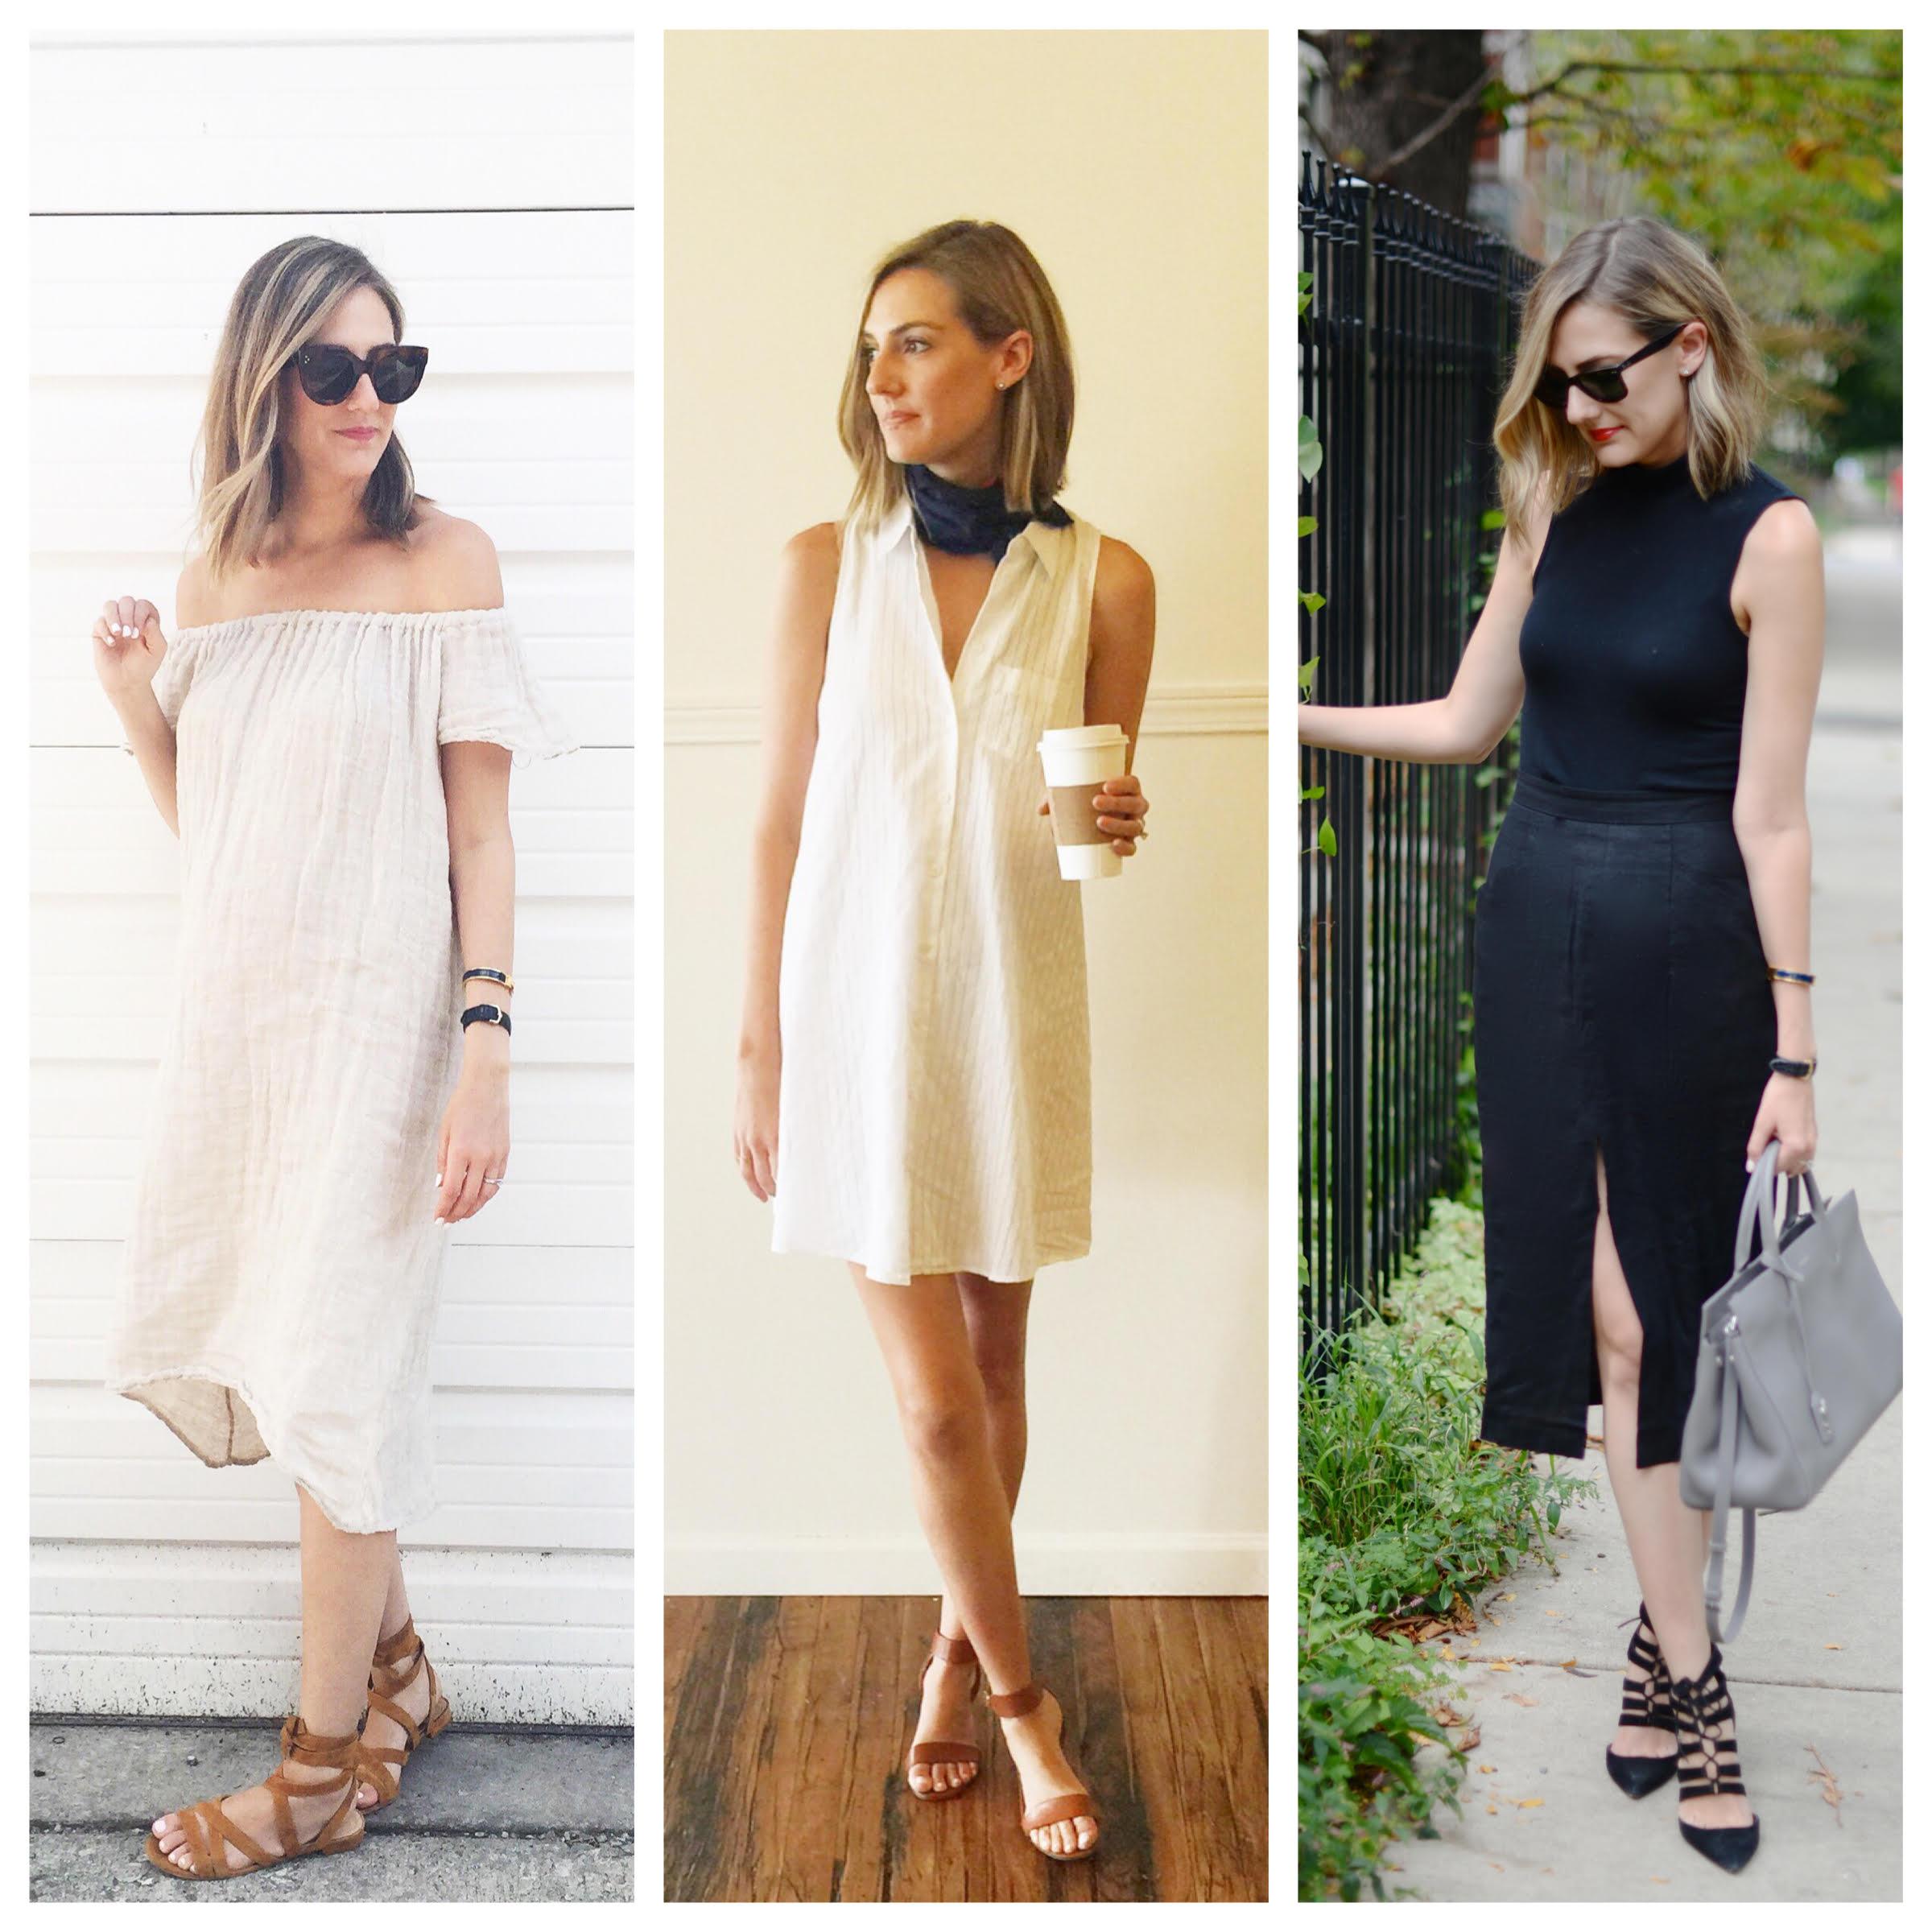 dress summer ideas maternity